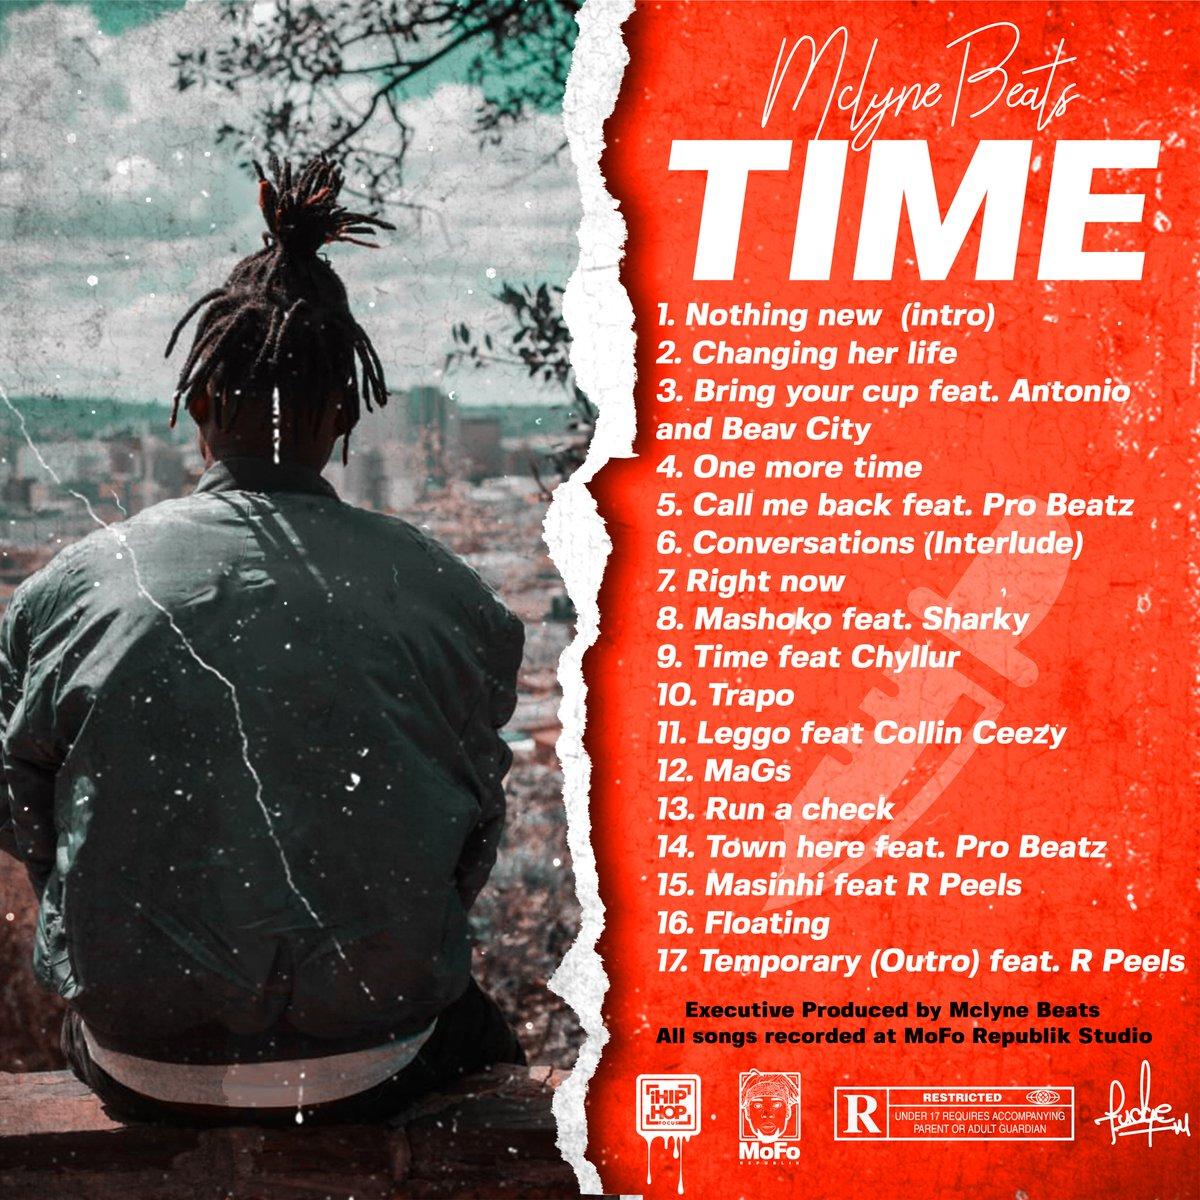 Mclyne Beats - TIME tracklist